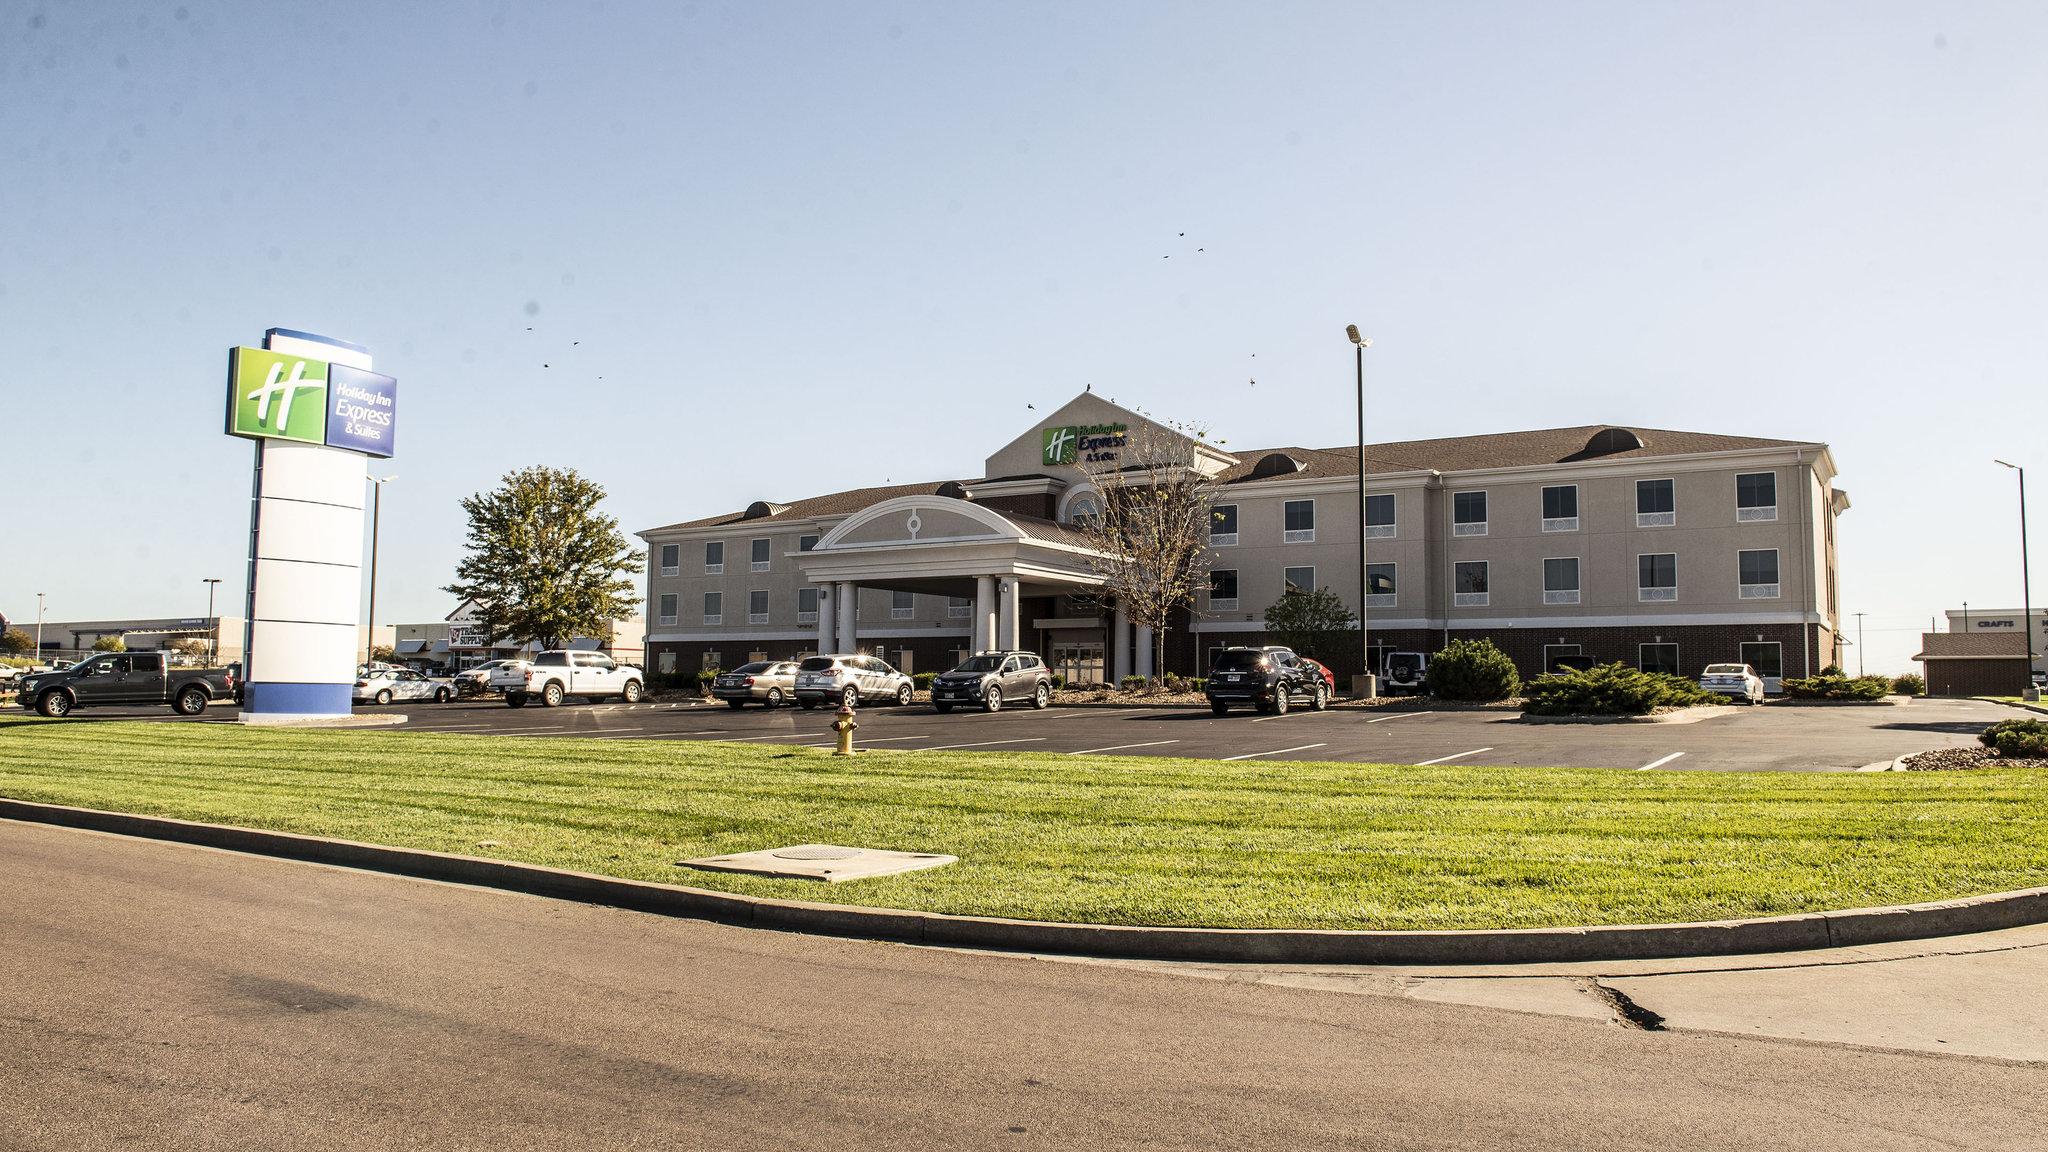 Holiday Inn Express Sedalia